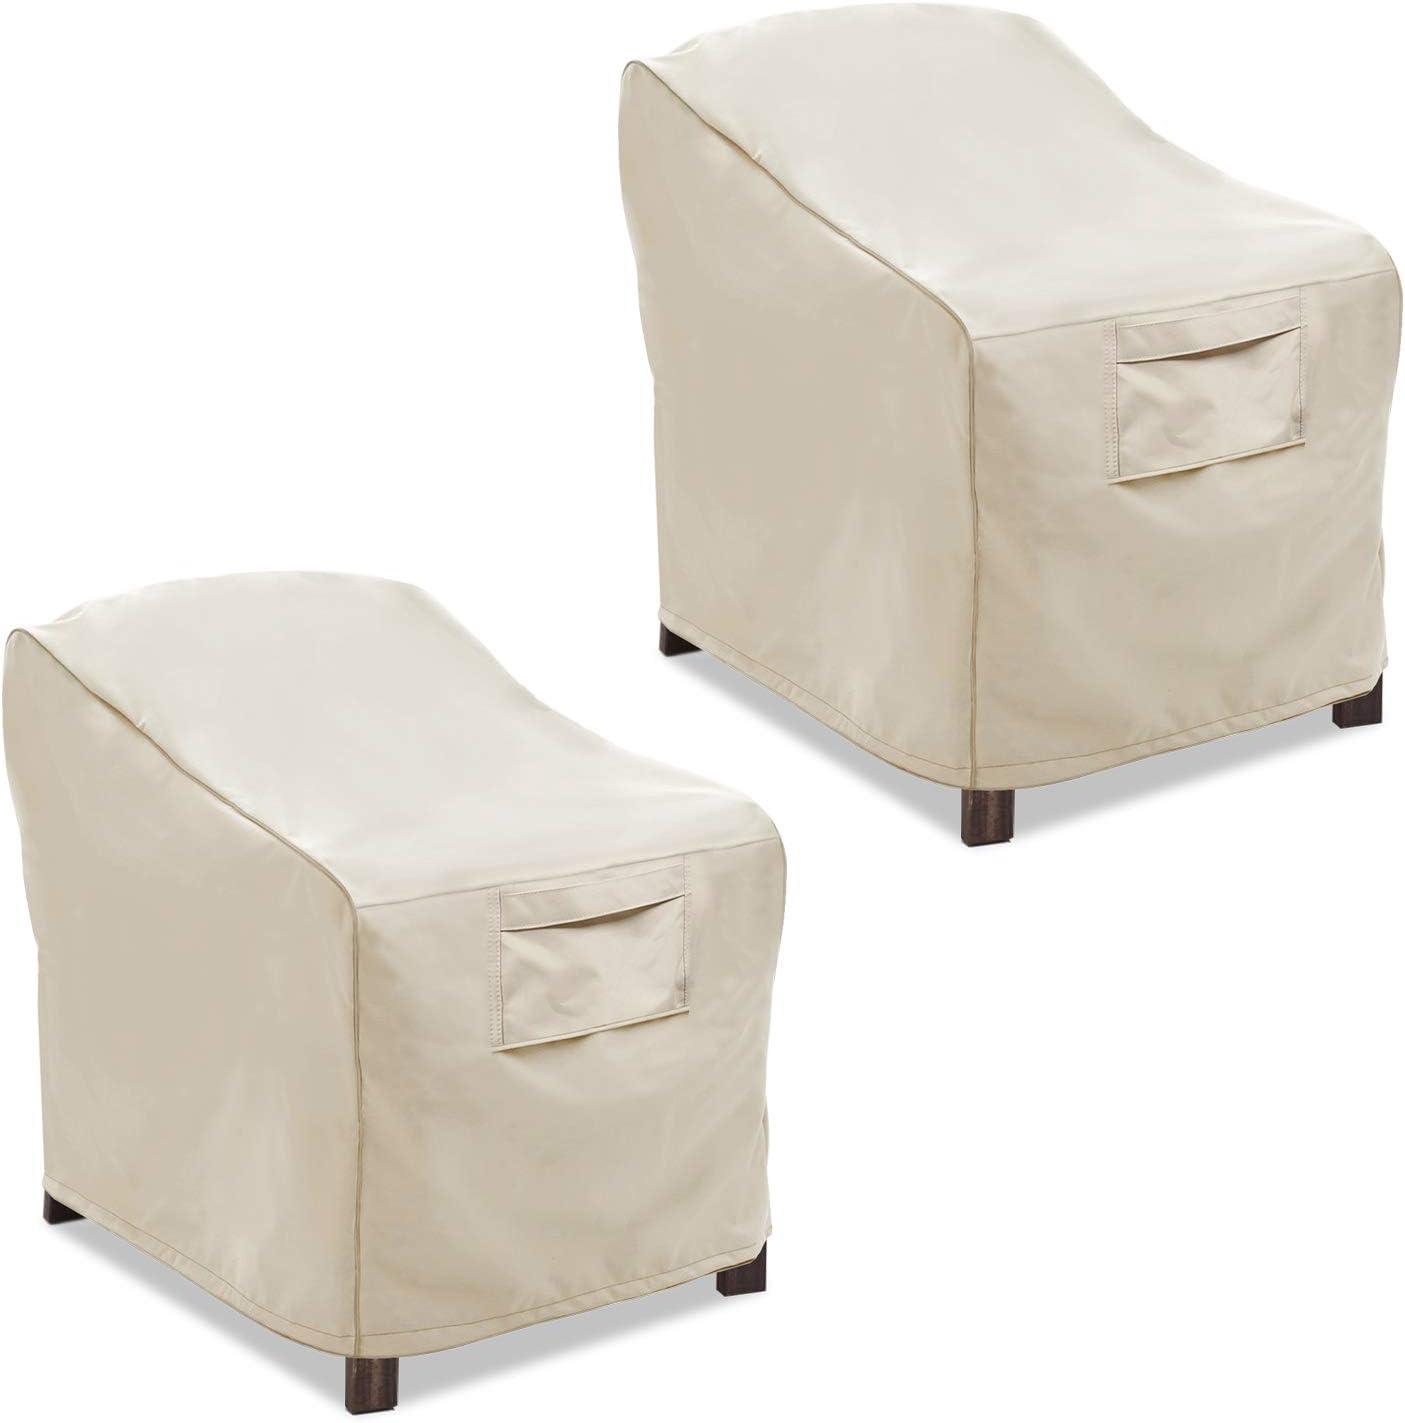 clear vinyl outdoor chair covers 33 x 27 x35 20 1 sayedbrothers nl u2022 rh 20 1 sayedbrothers nl